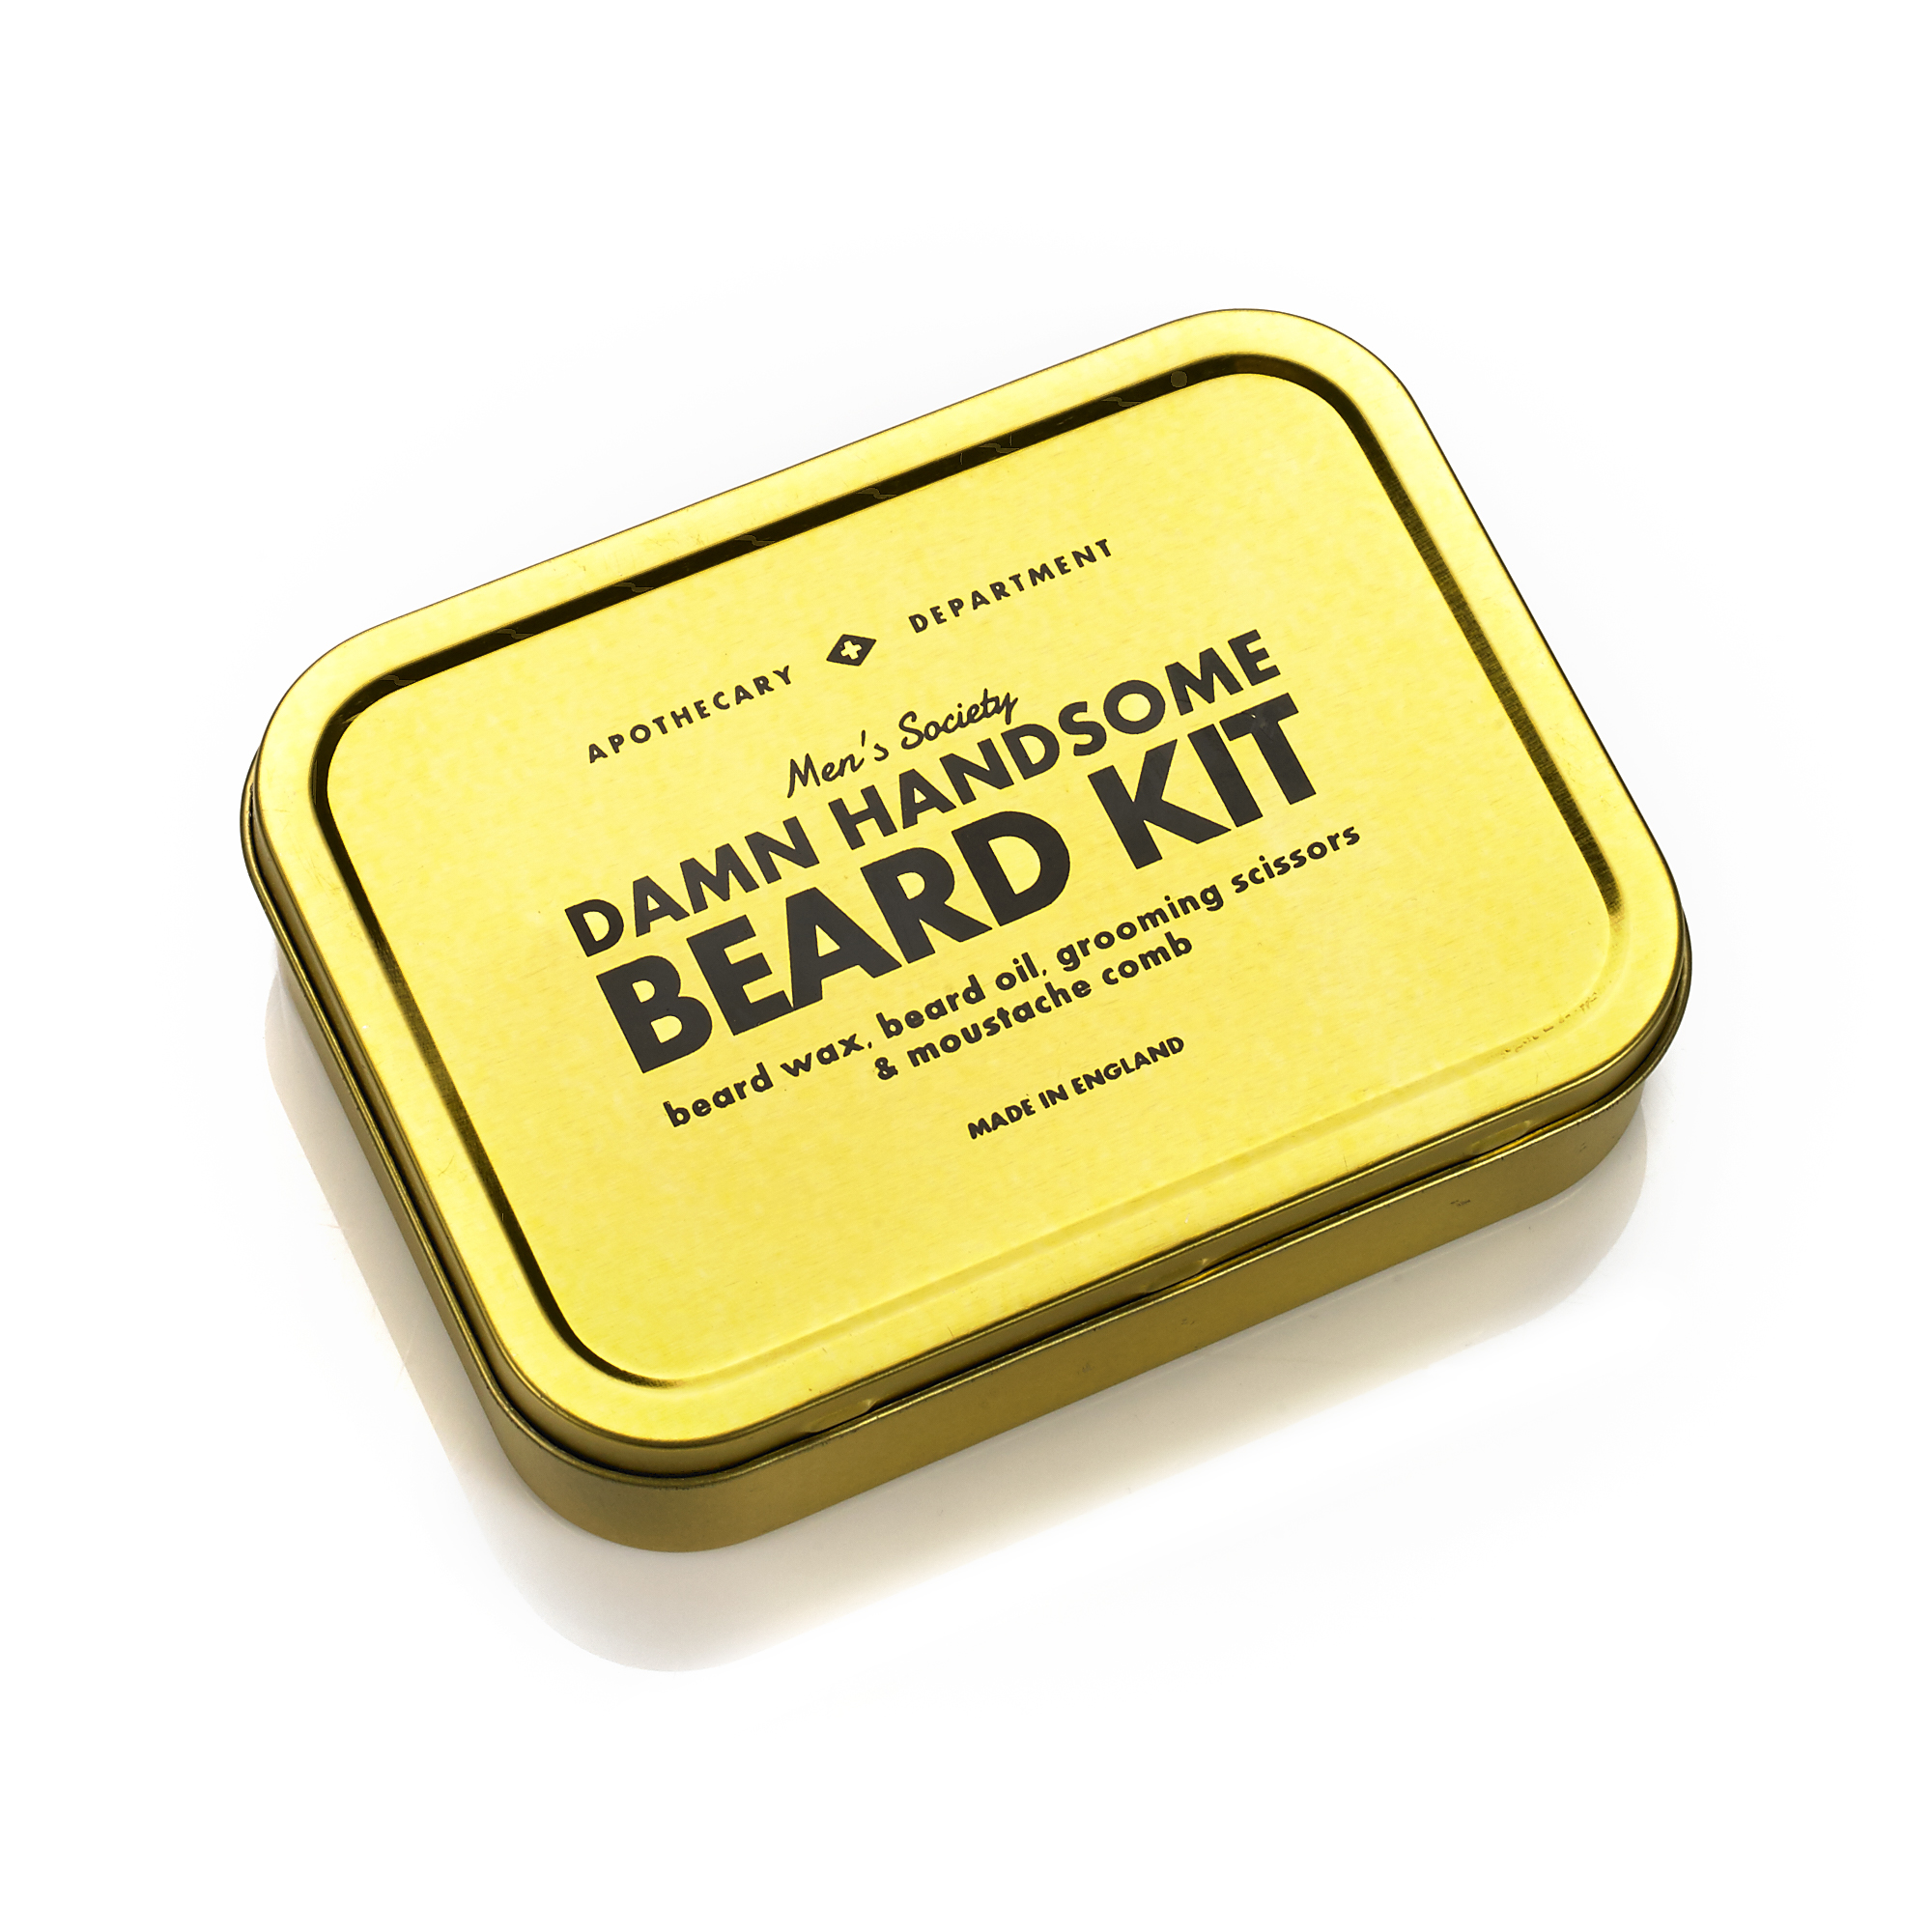 beard grooming kit royal academy of arts shop. Black Bedroom Furniture Sets. Home Design Ideas